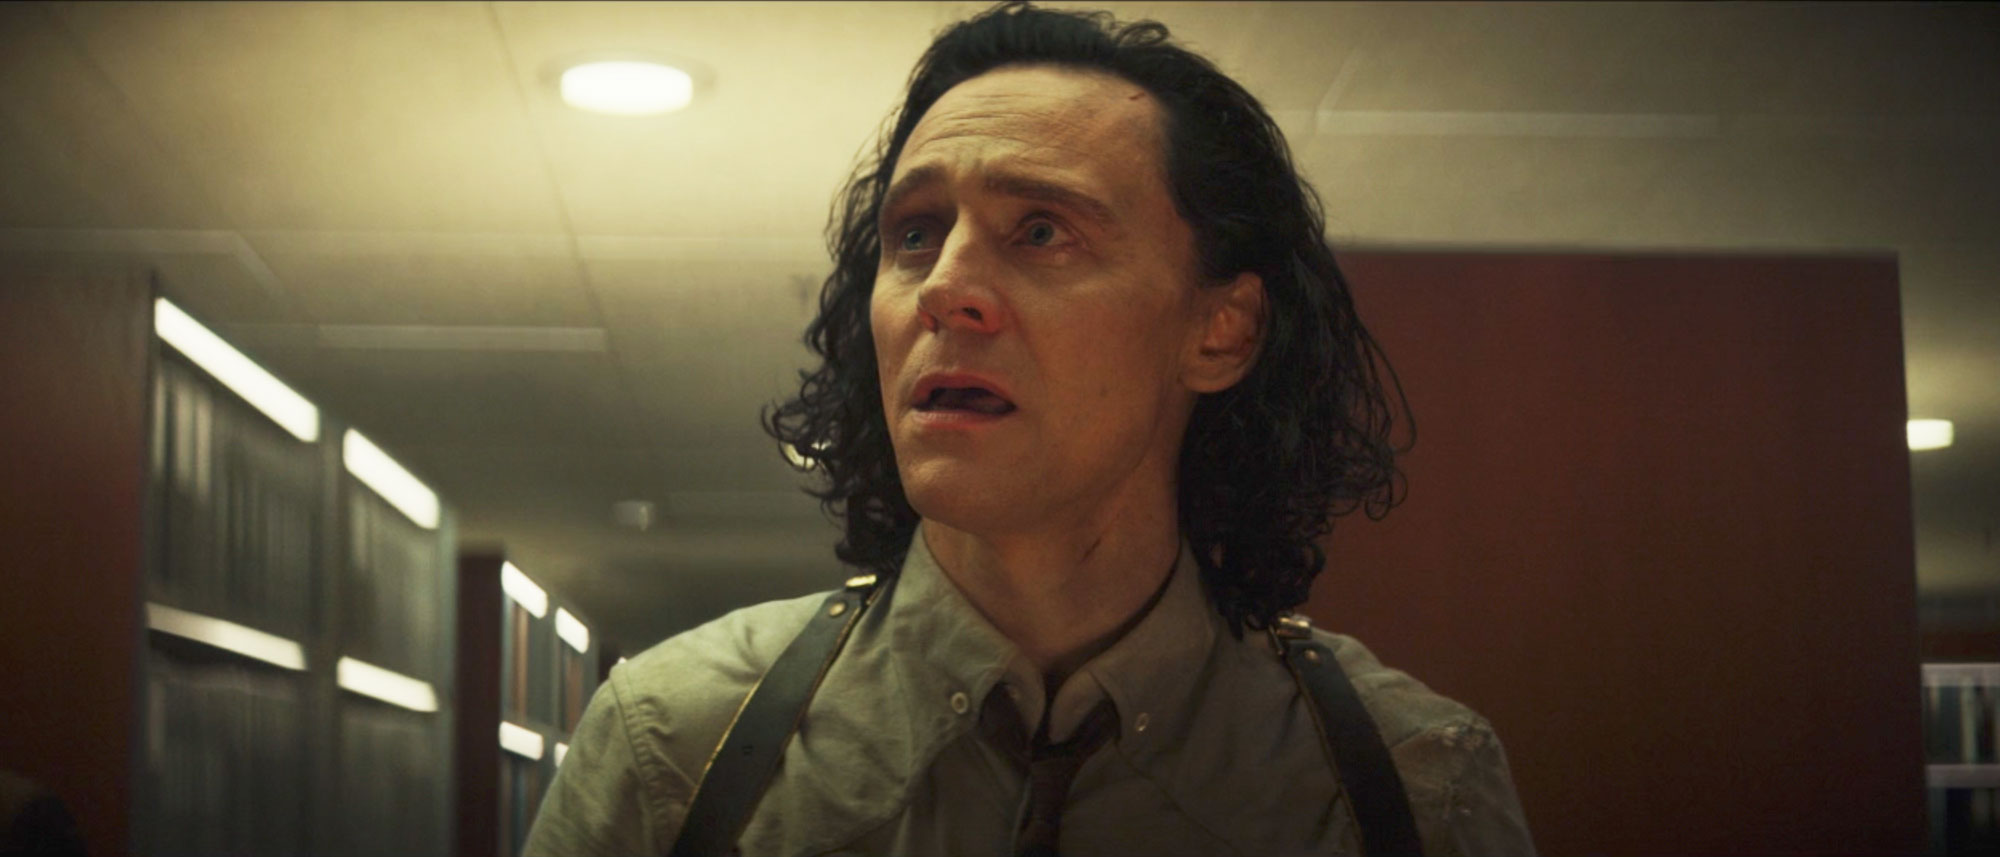 Tom-Hiddleston-Loki-Season-2